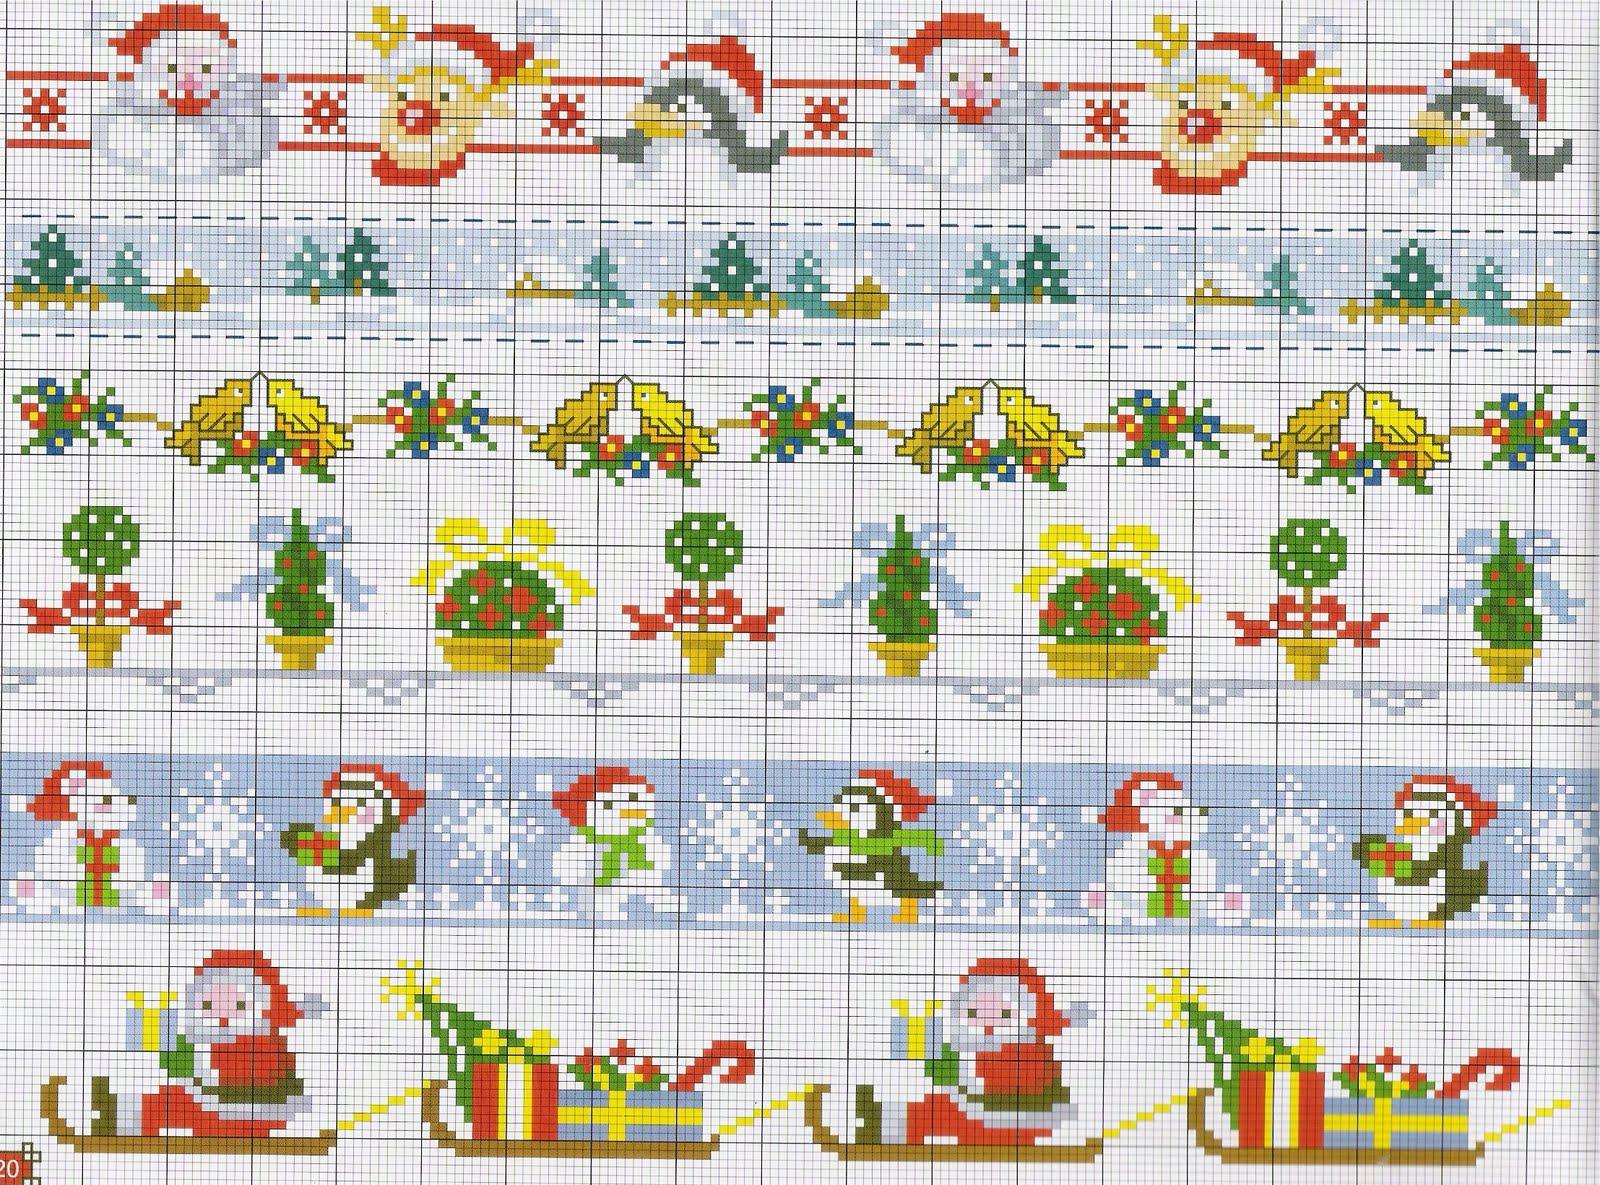 1000 images about cross stitch on pinterest margaret - Manteles para navidad ...